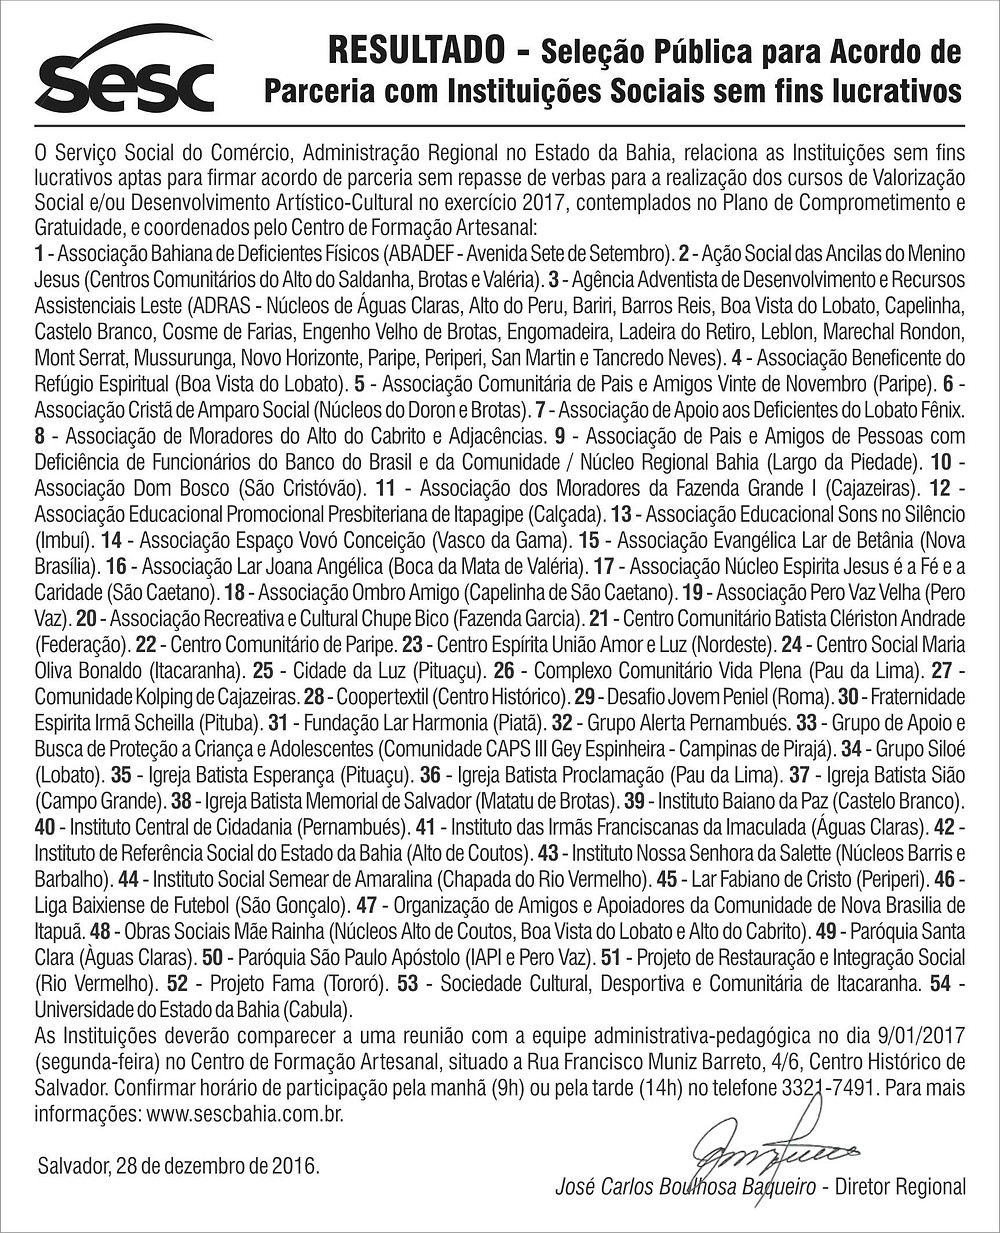 Projeto FAMA parceria Sesc